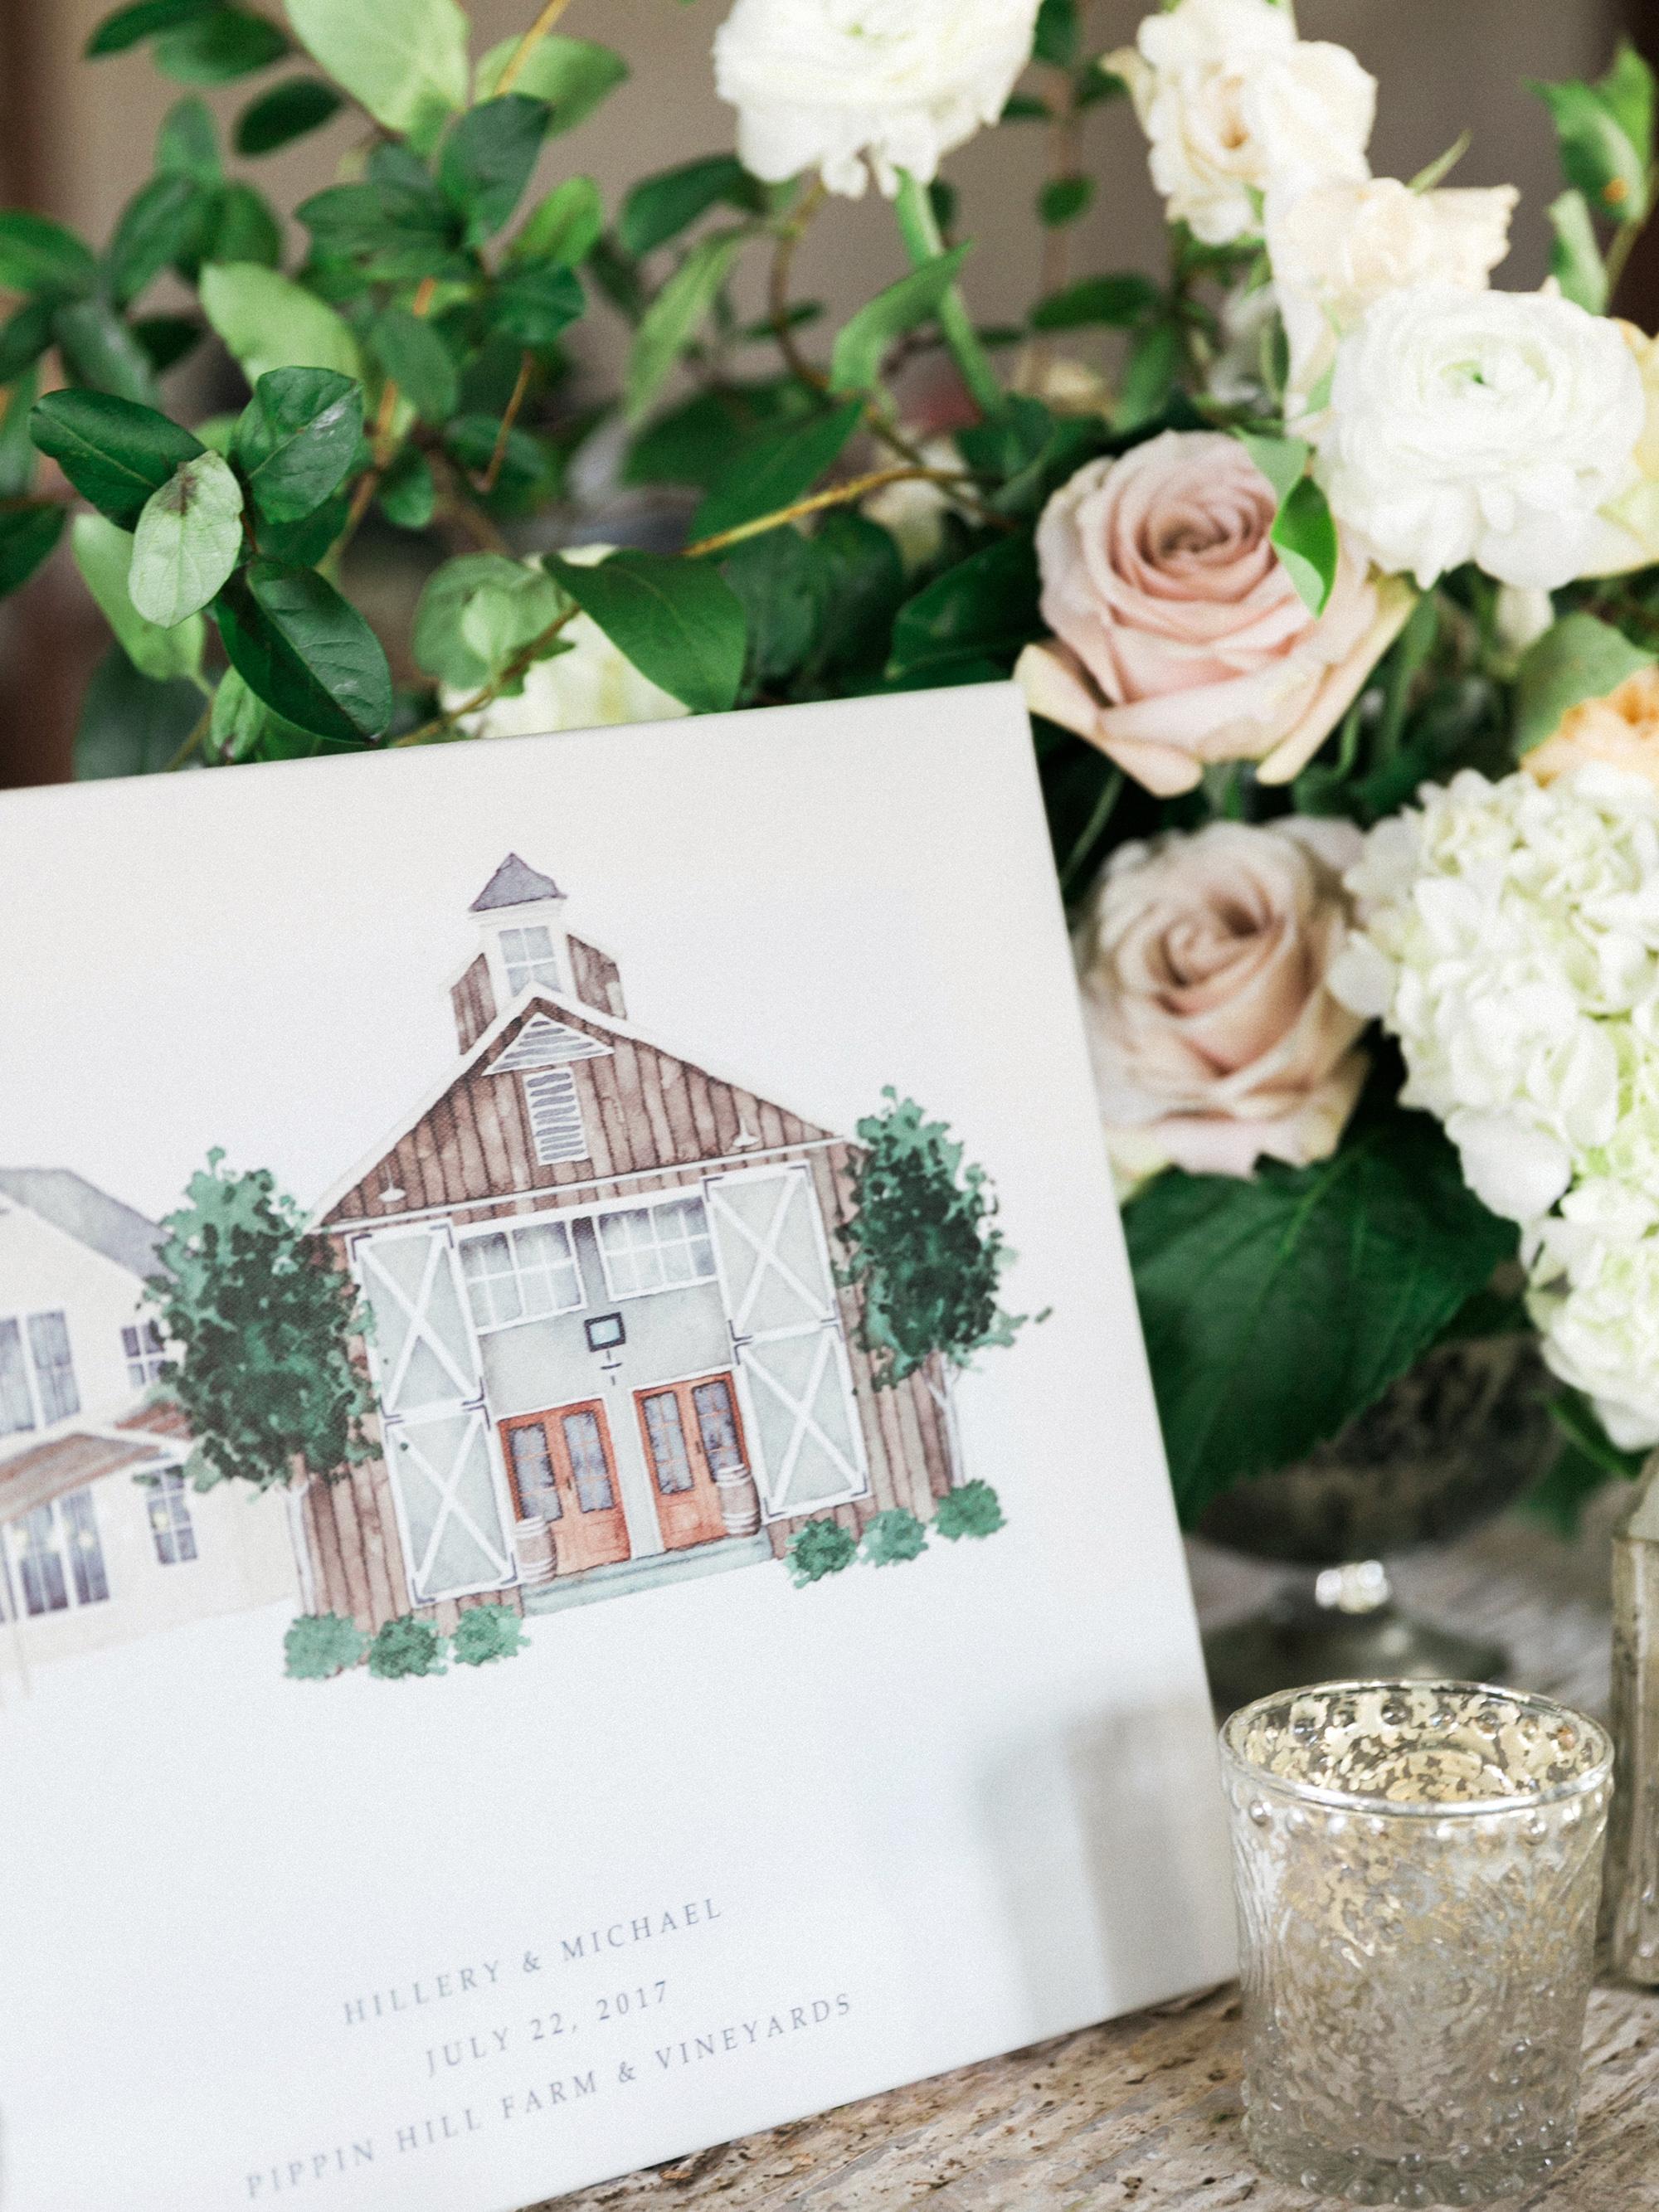 wedding illustrated barn venue signage flowers candle